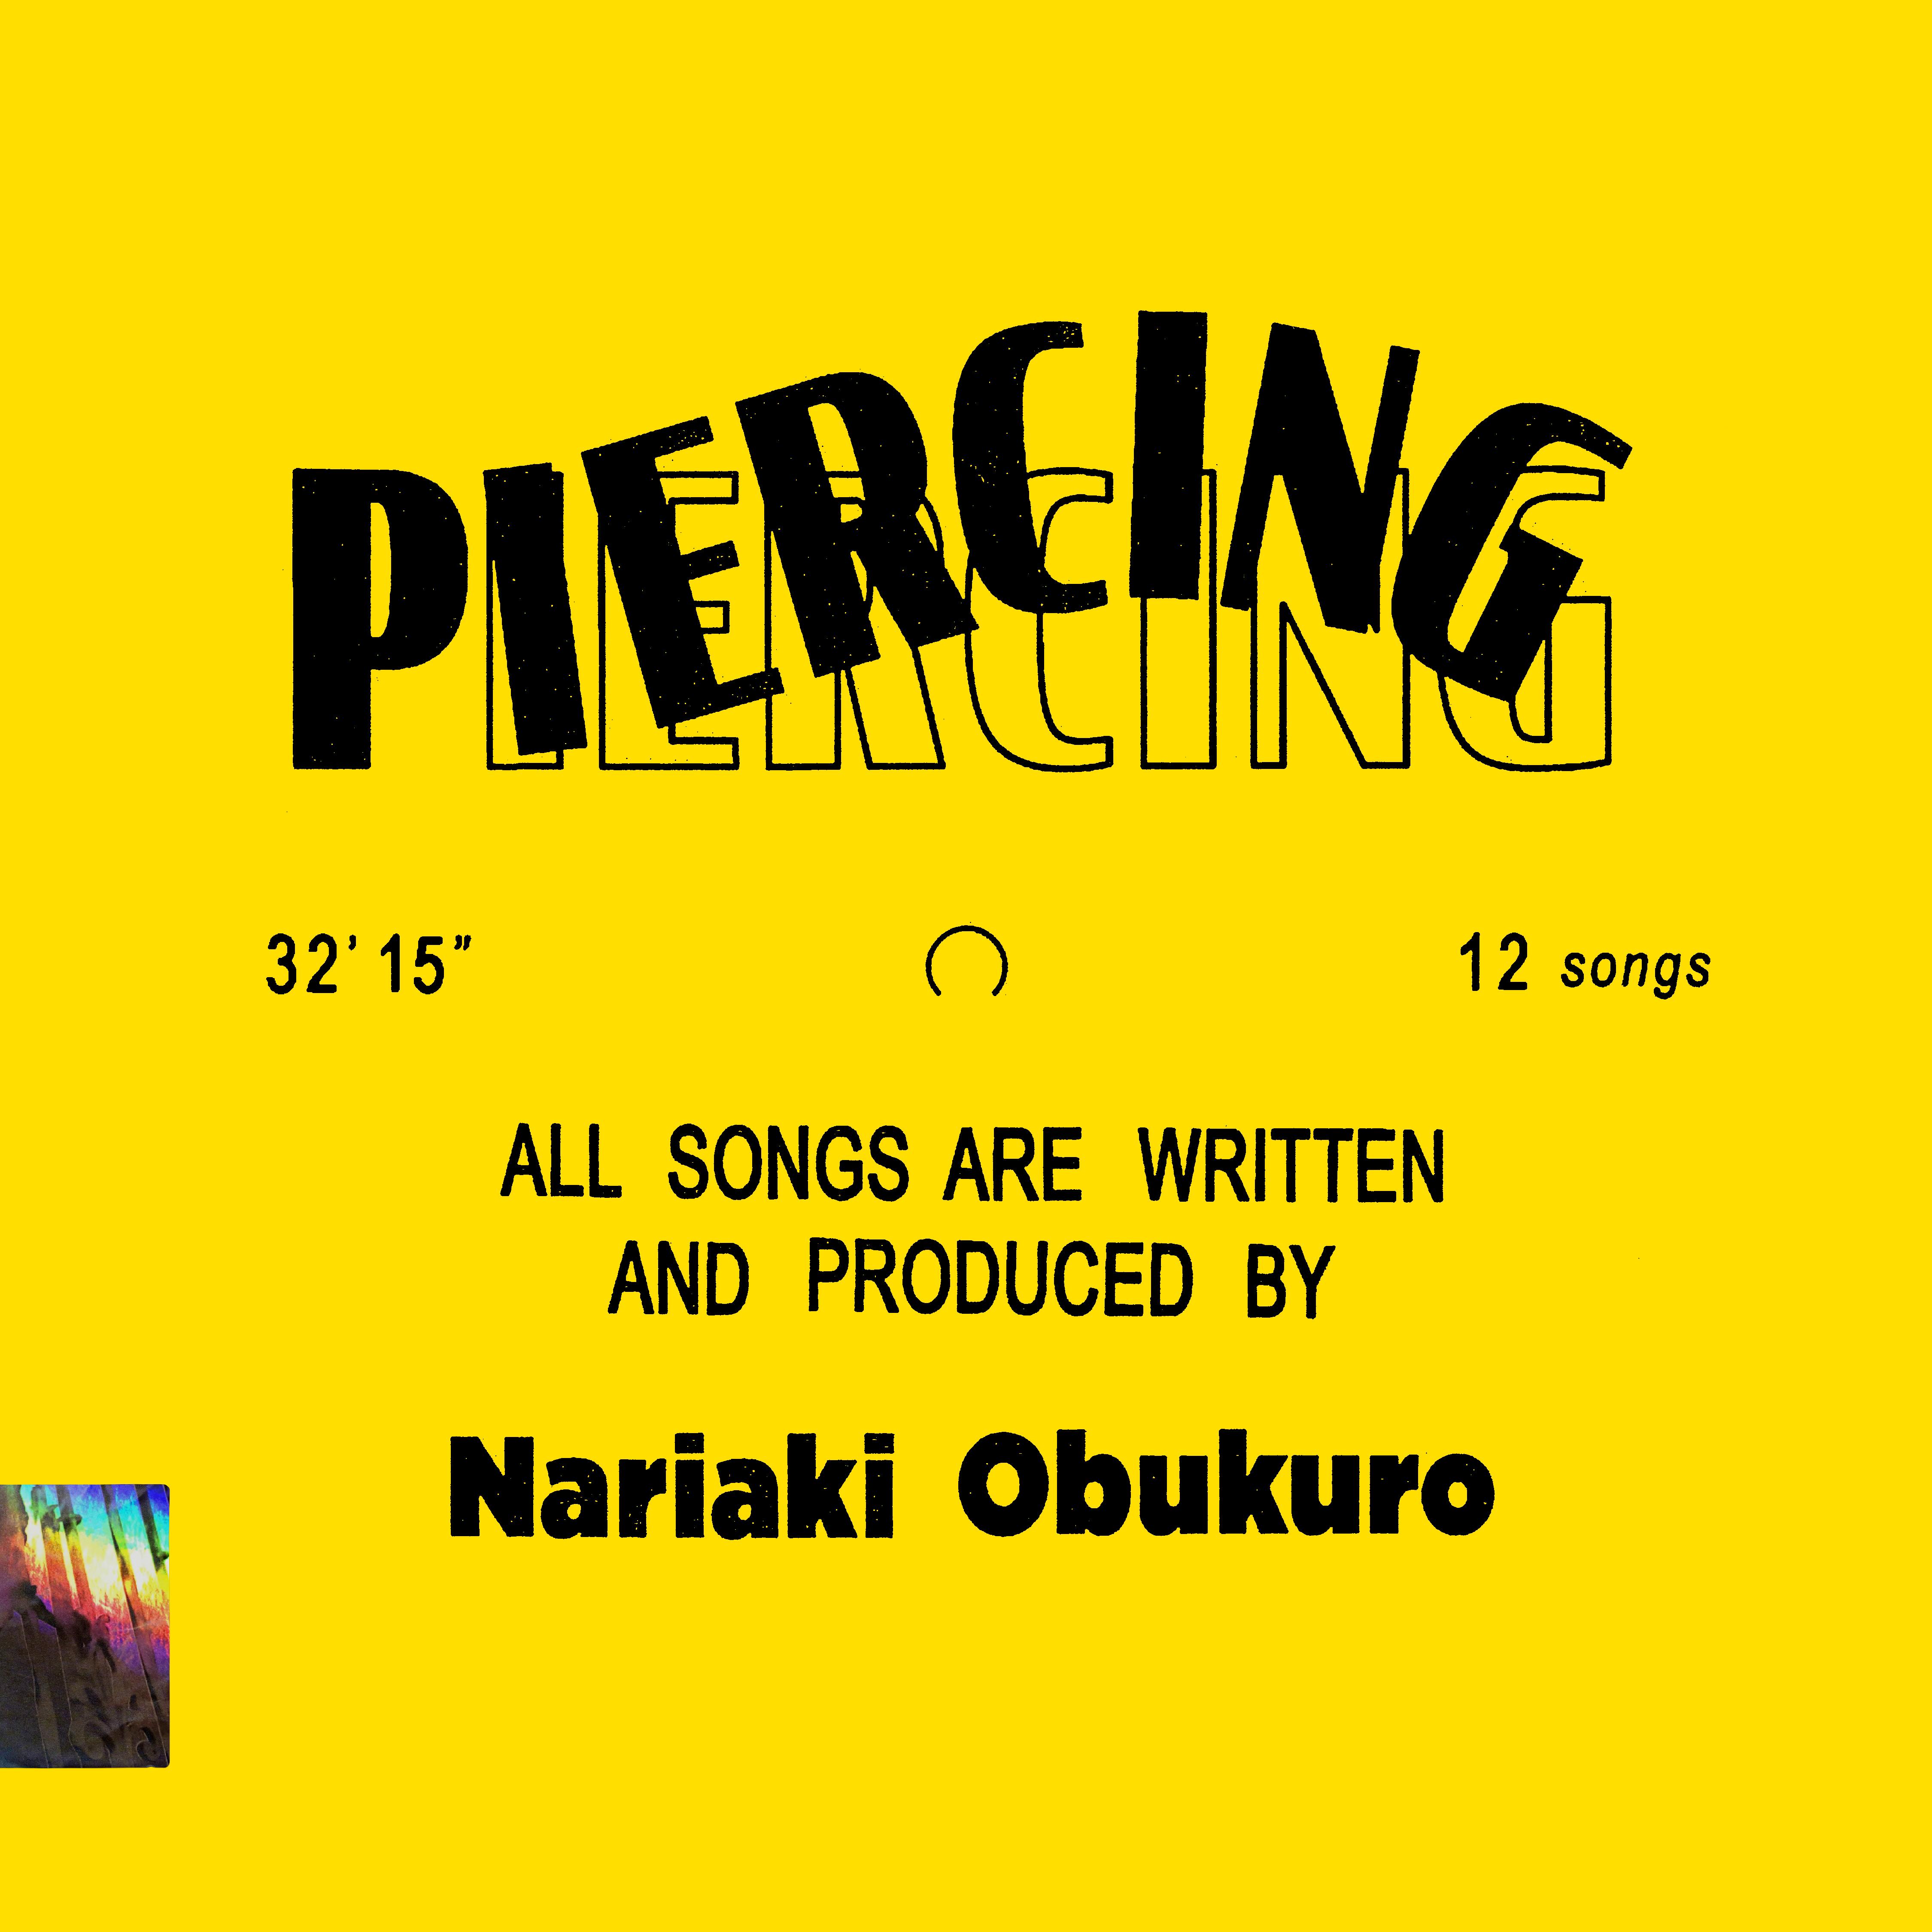 『Piercing』